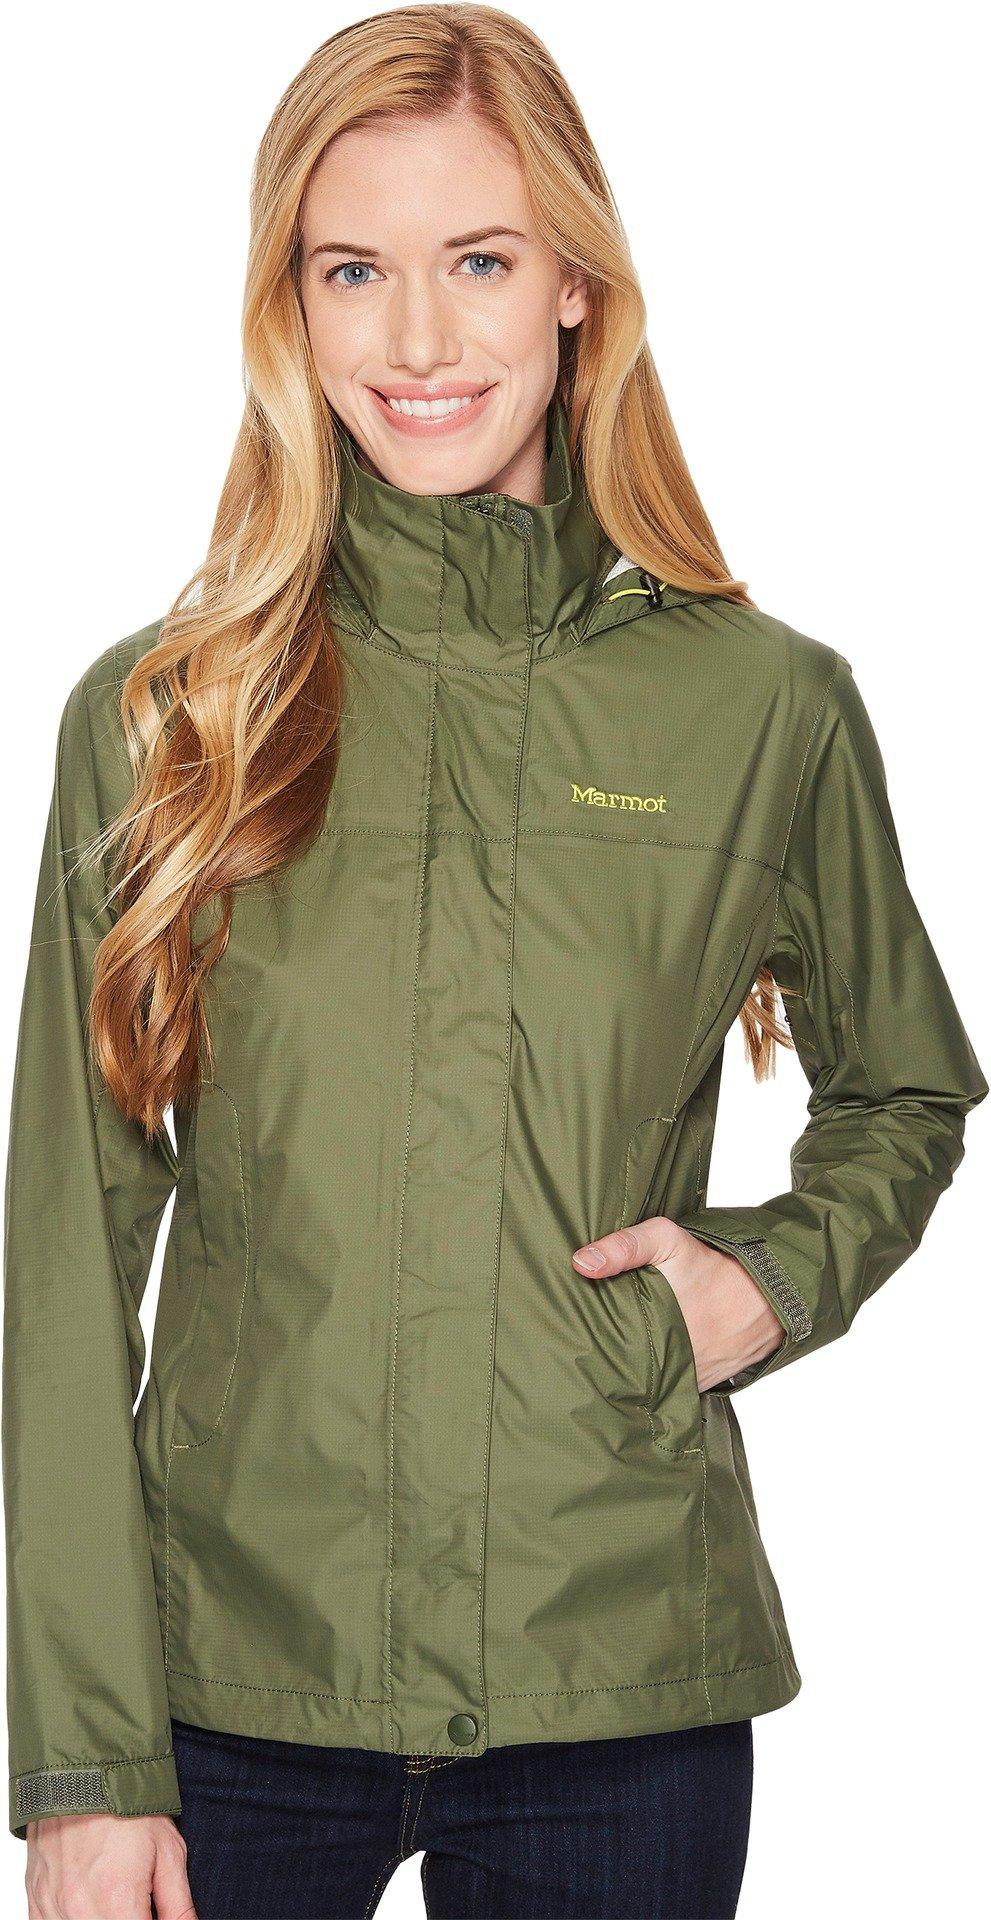 Marmot Women's PreCip Jacket Crocodile XX-Large by Marmot